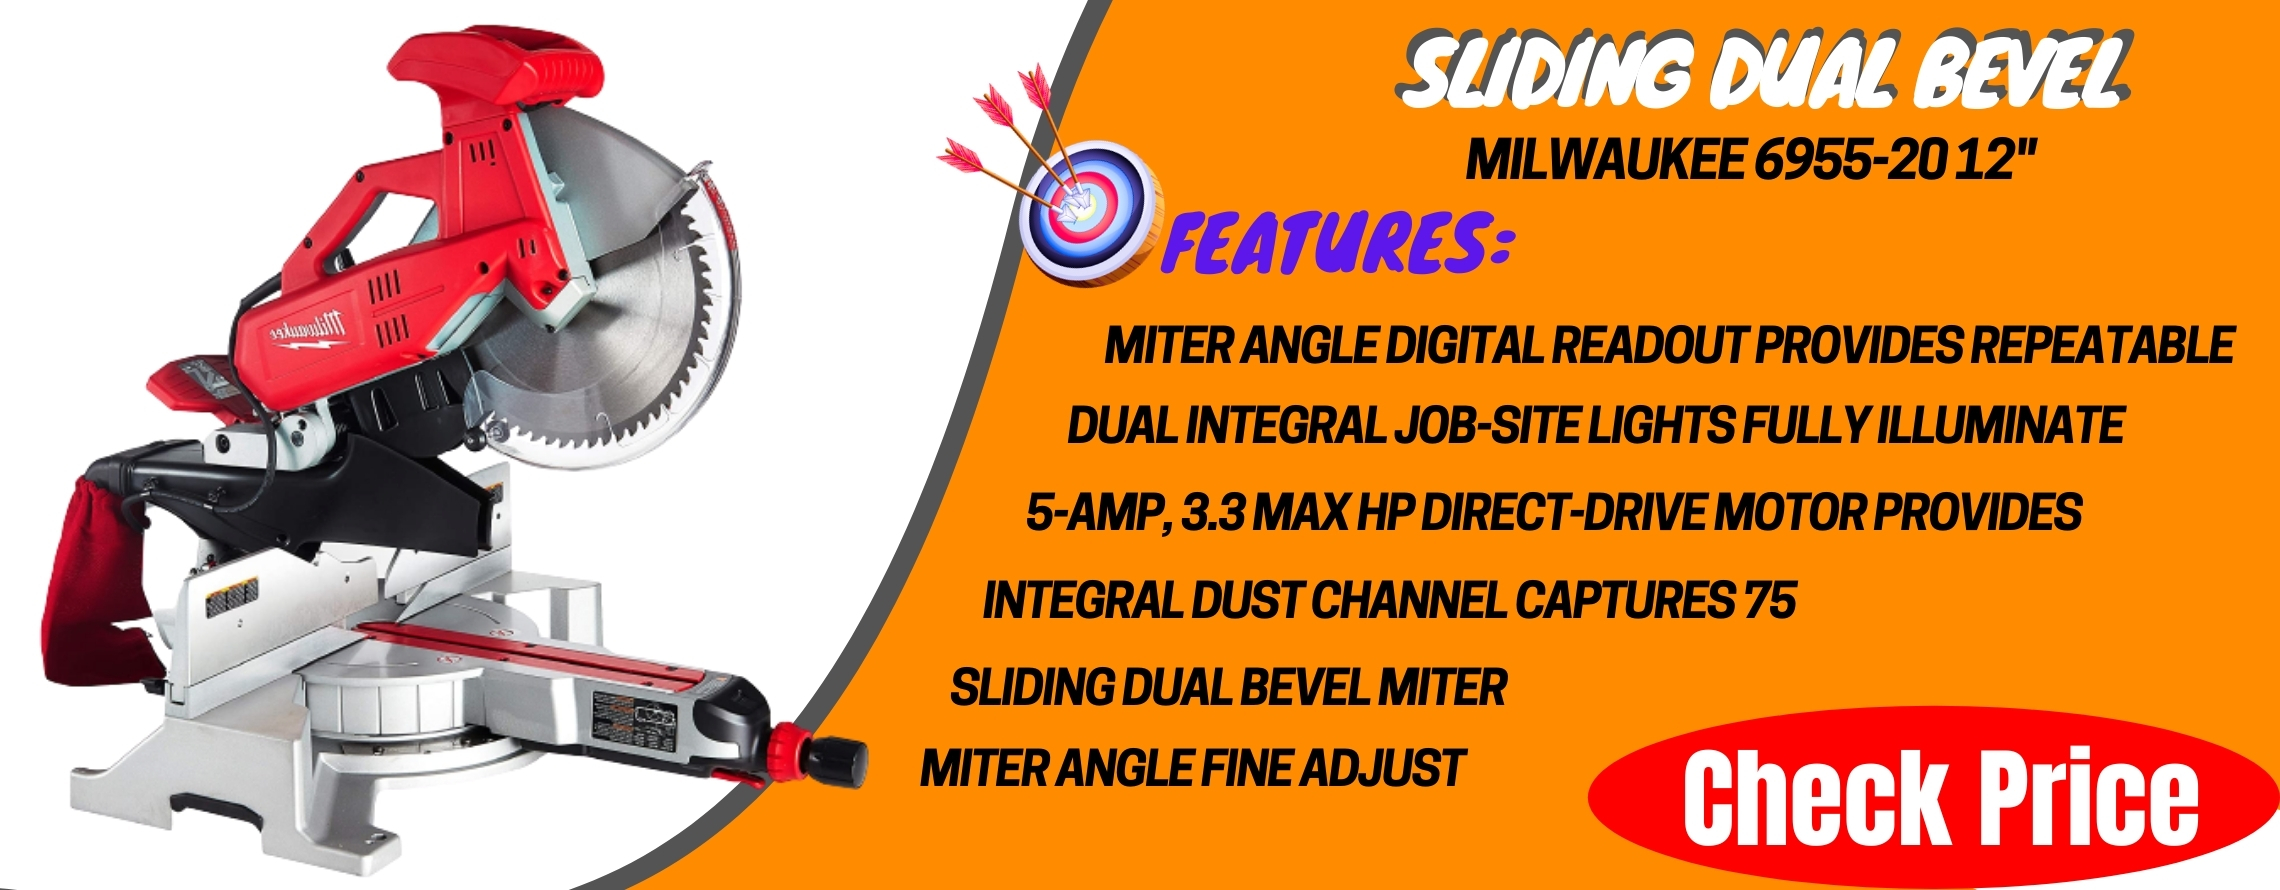 Milwaukee 6955-20 12_ Sliding Dual Bevel Miter Saw